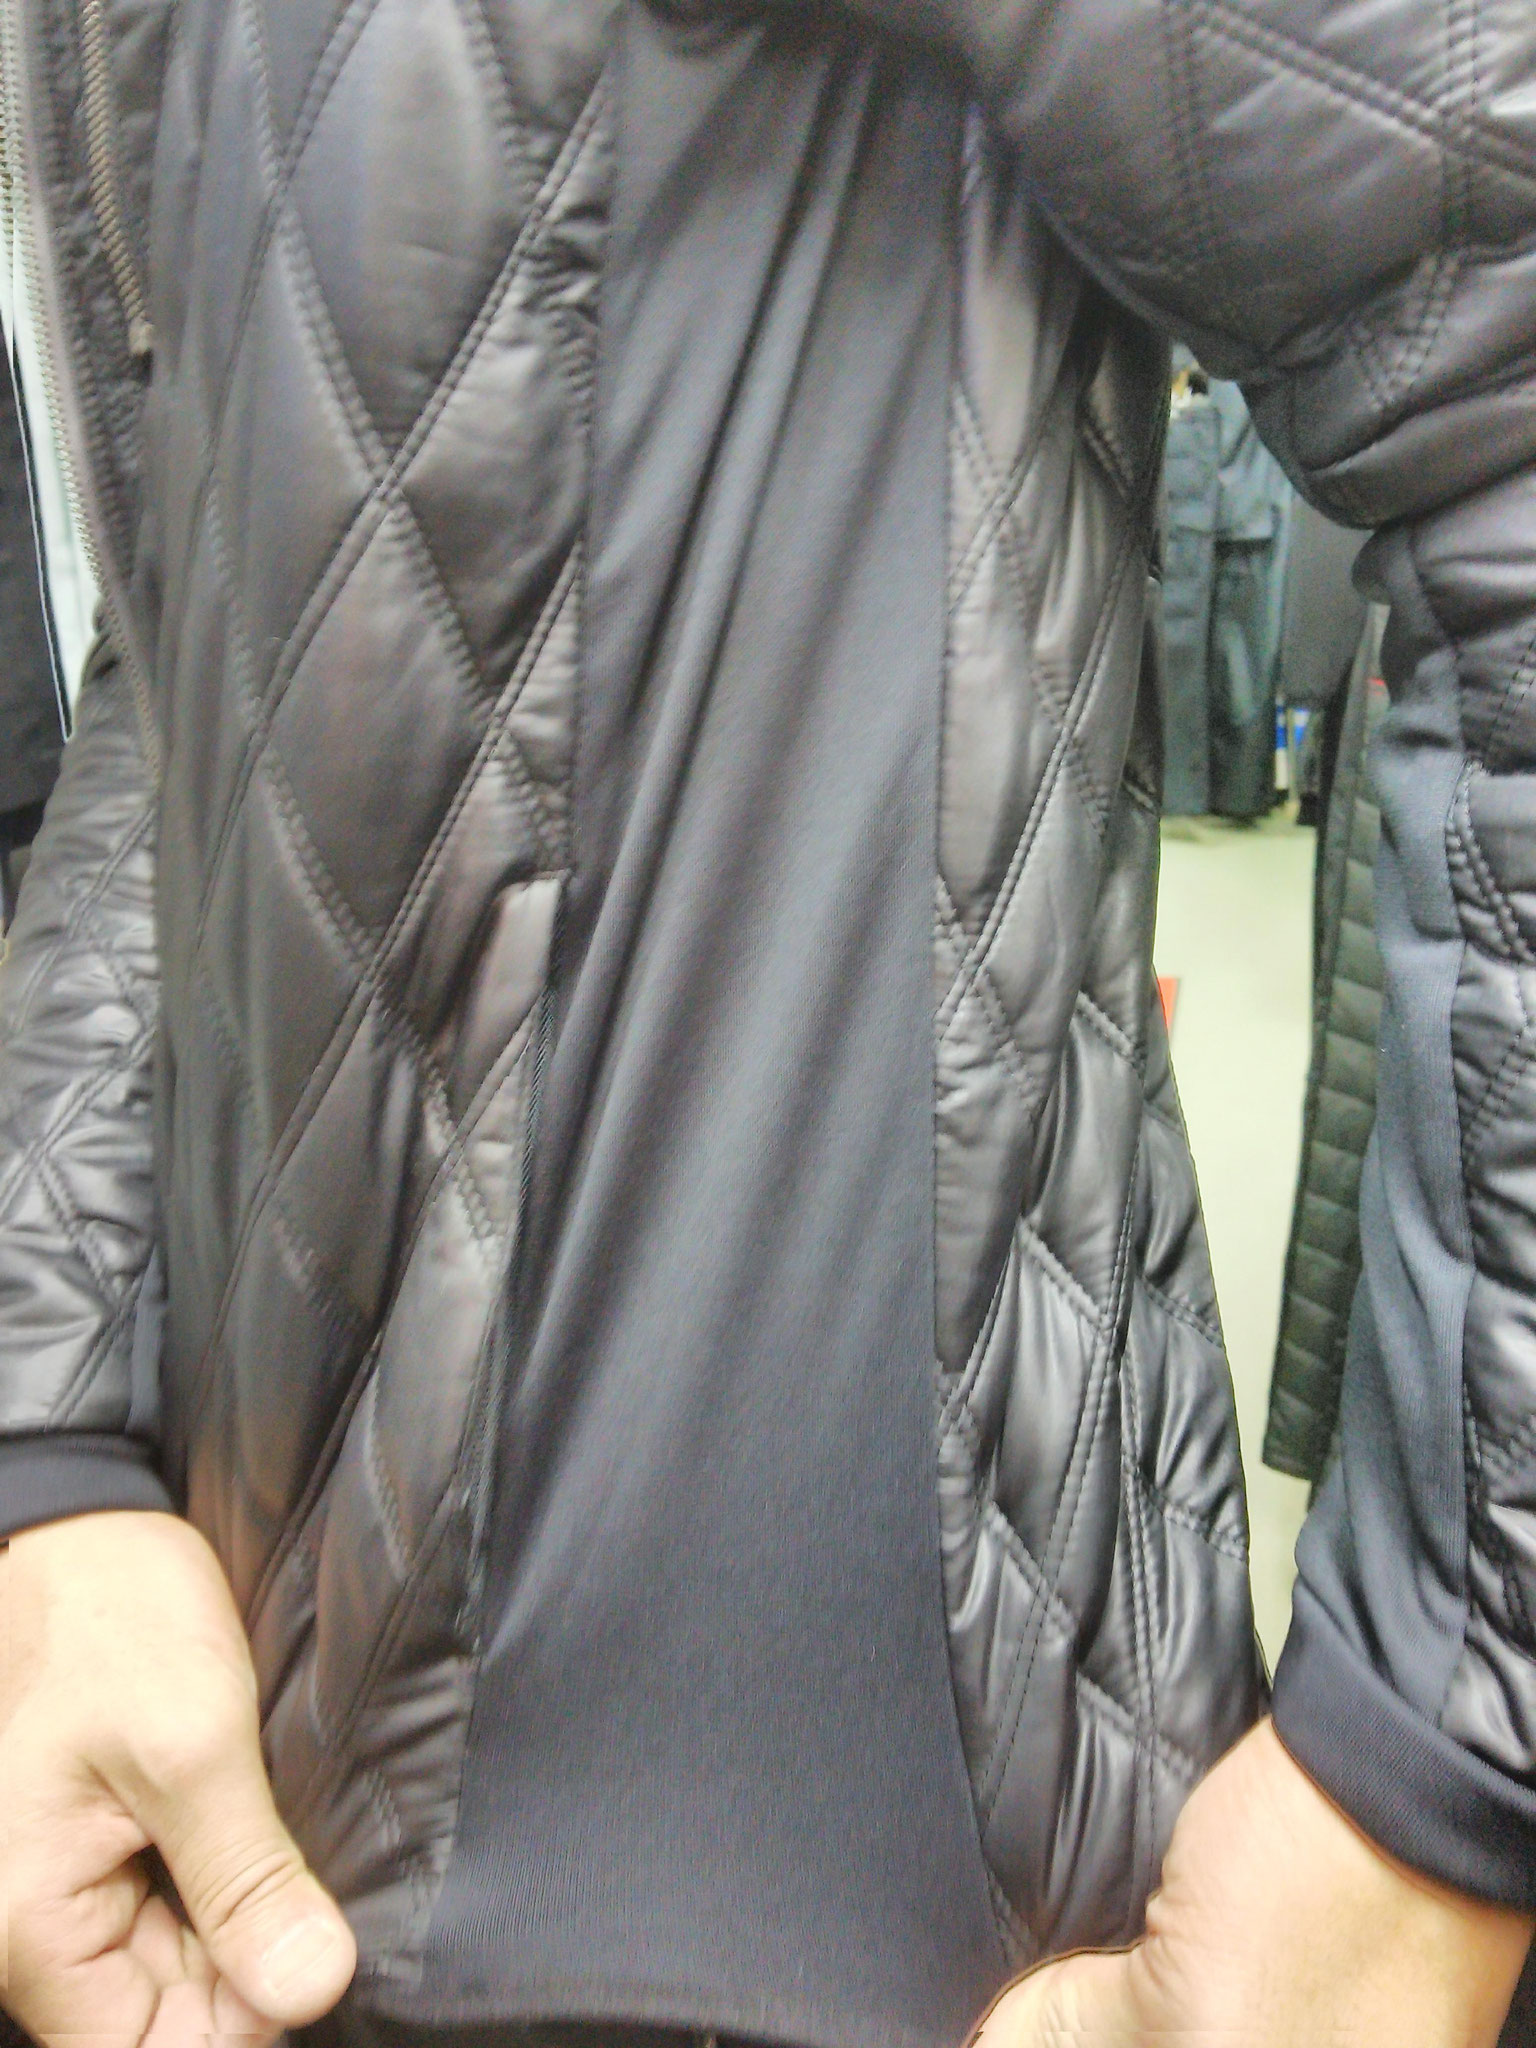 I'Z FRONTIER~アイズフロンティア~9010 発熱防寒ジャケット サイドストレッチ素材で動きやすいです。